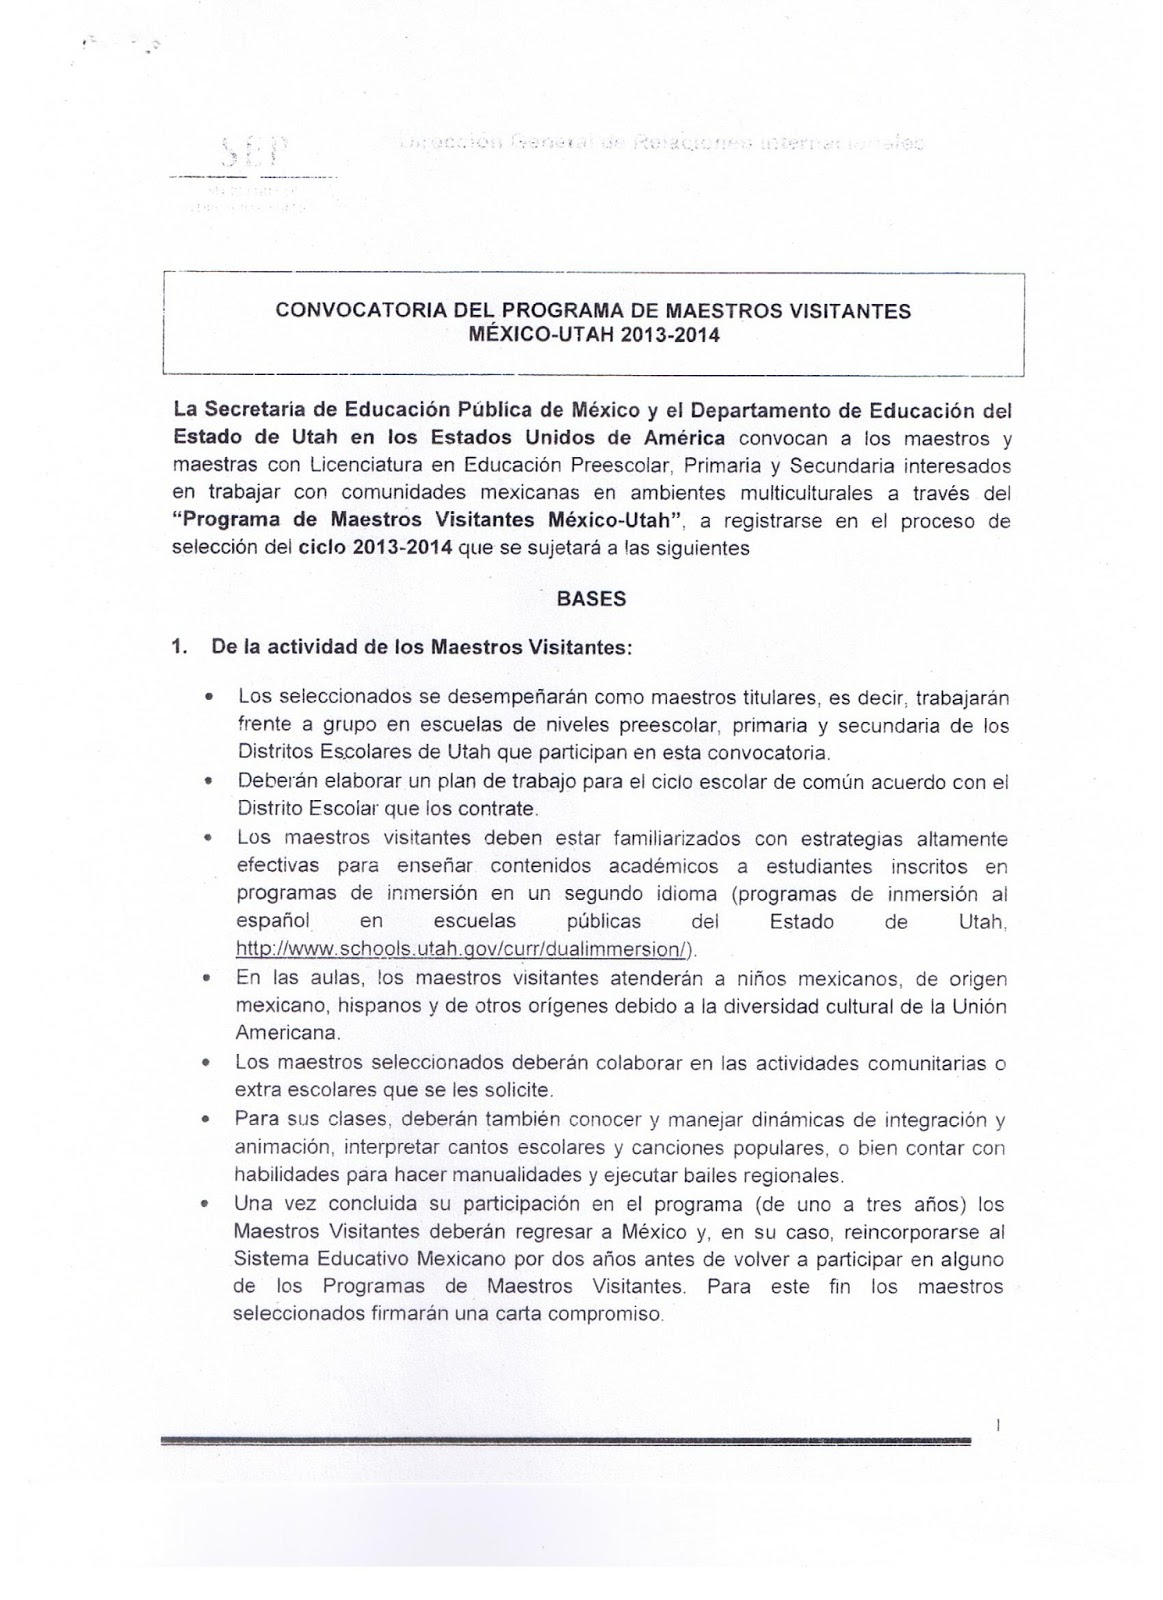 Sector 19 convocatoria del programa de maestros for Convocatoria de maestros